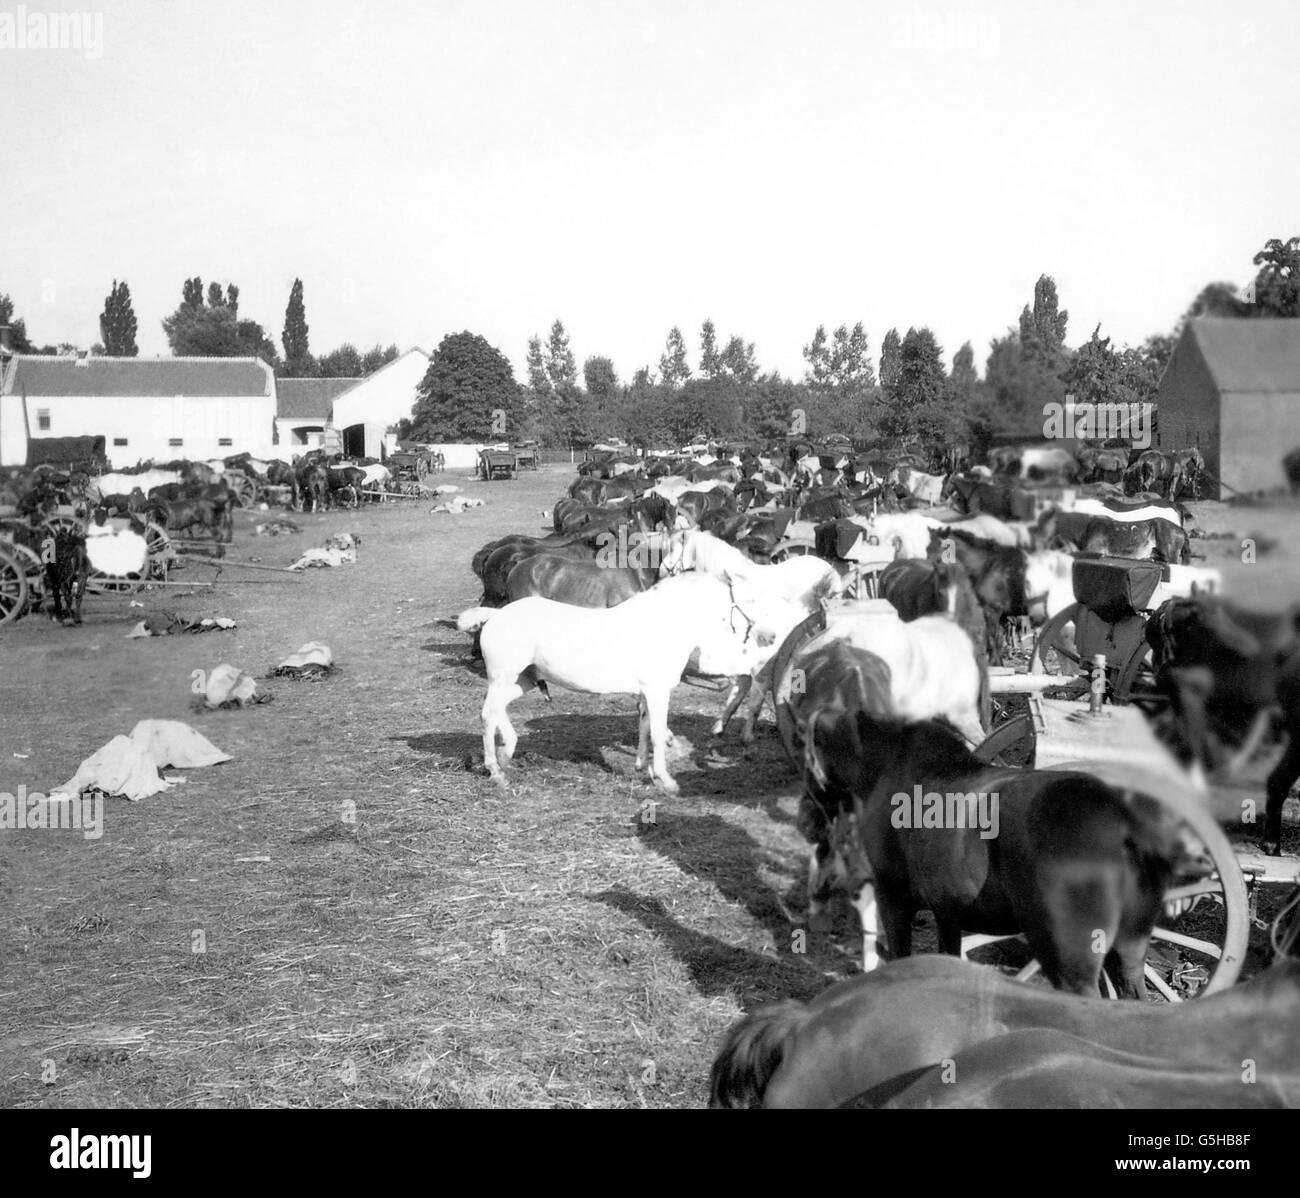 World War One - Horses - Belgian Camp - Netherlands - Stock Image